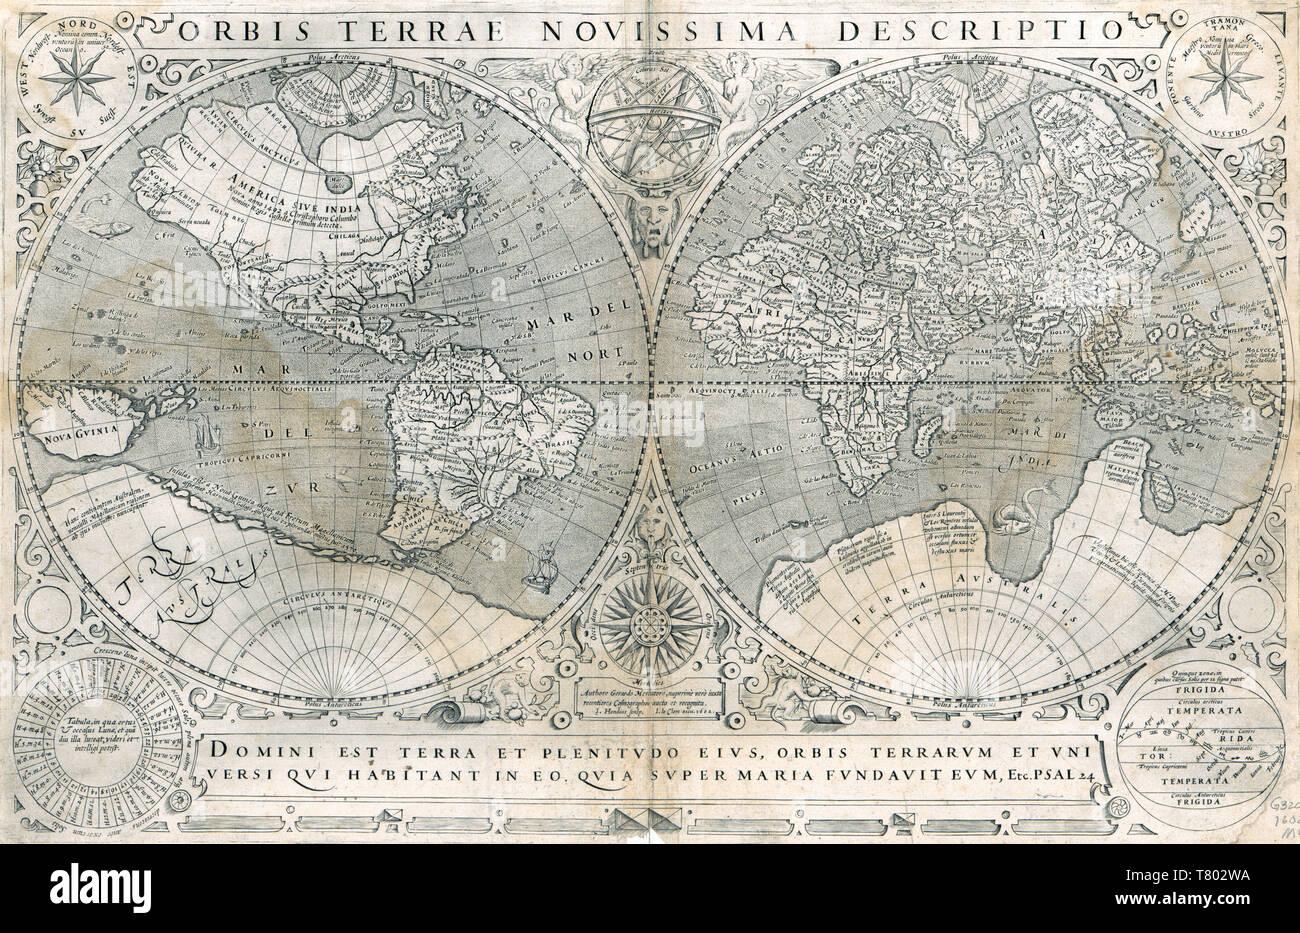 Gerardus Mercator, World Map, 1602 - Stock Image